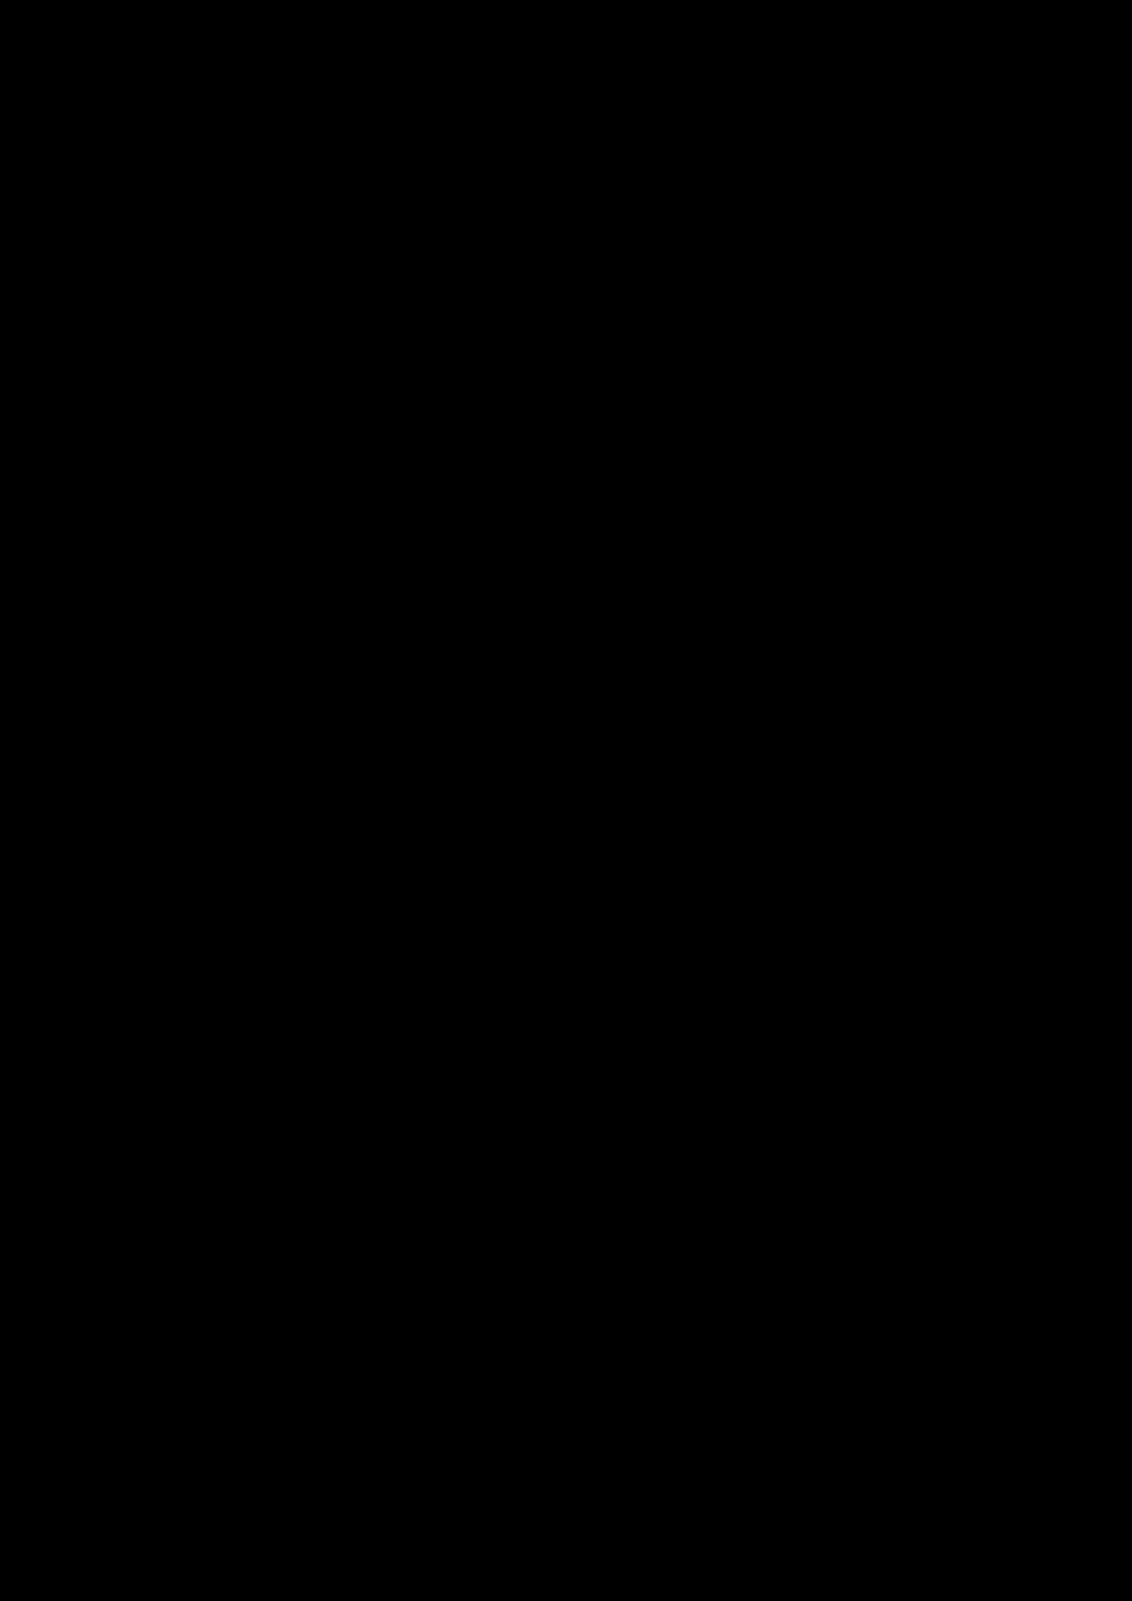 Belyiy sokol slide, Image 206